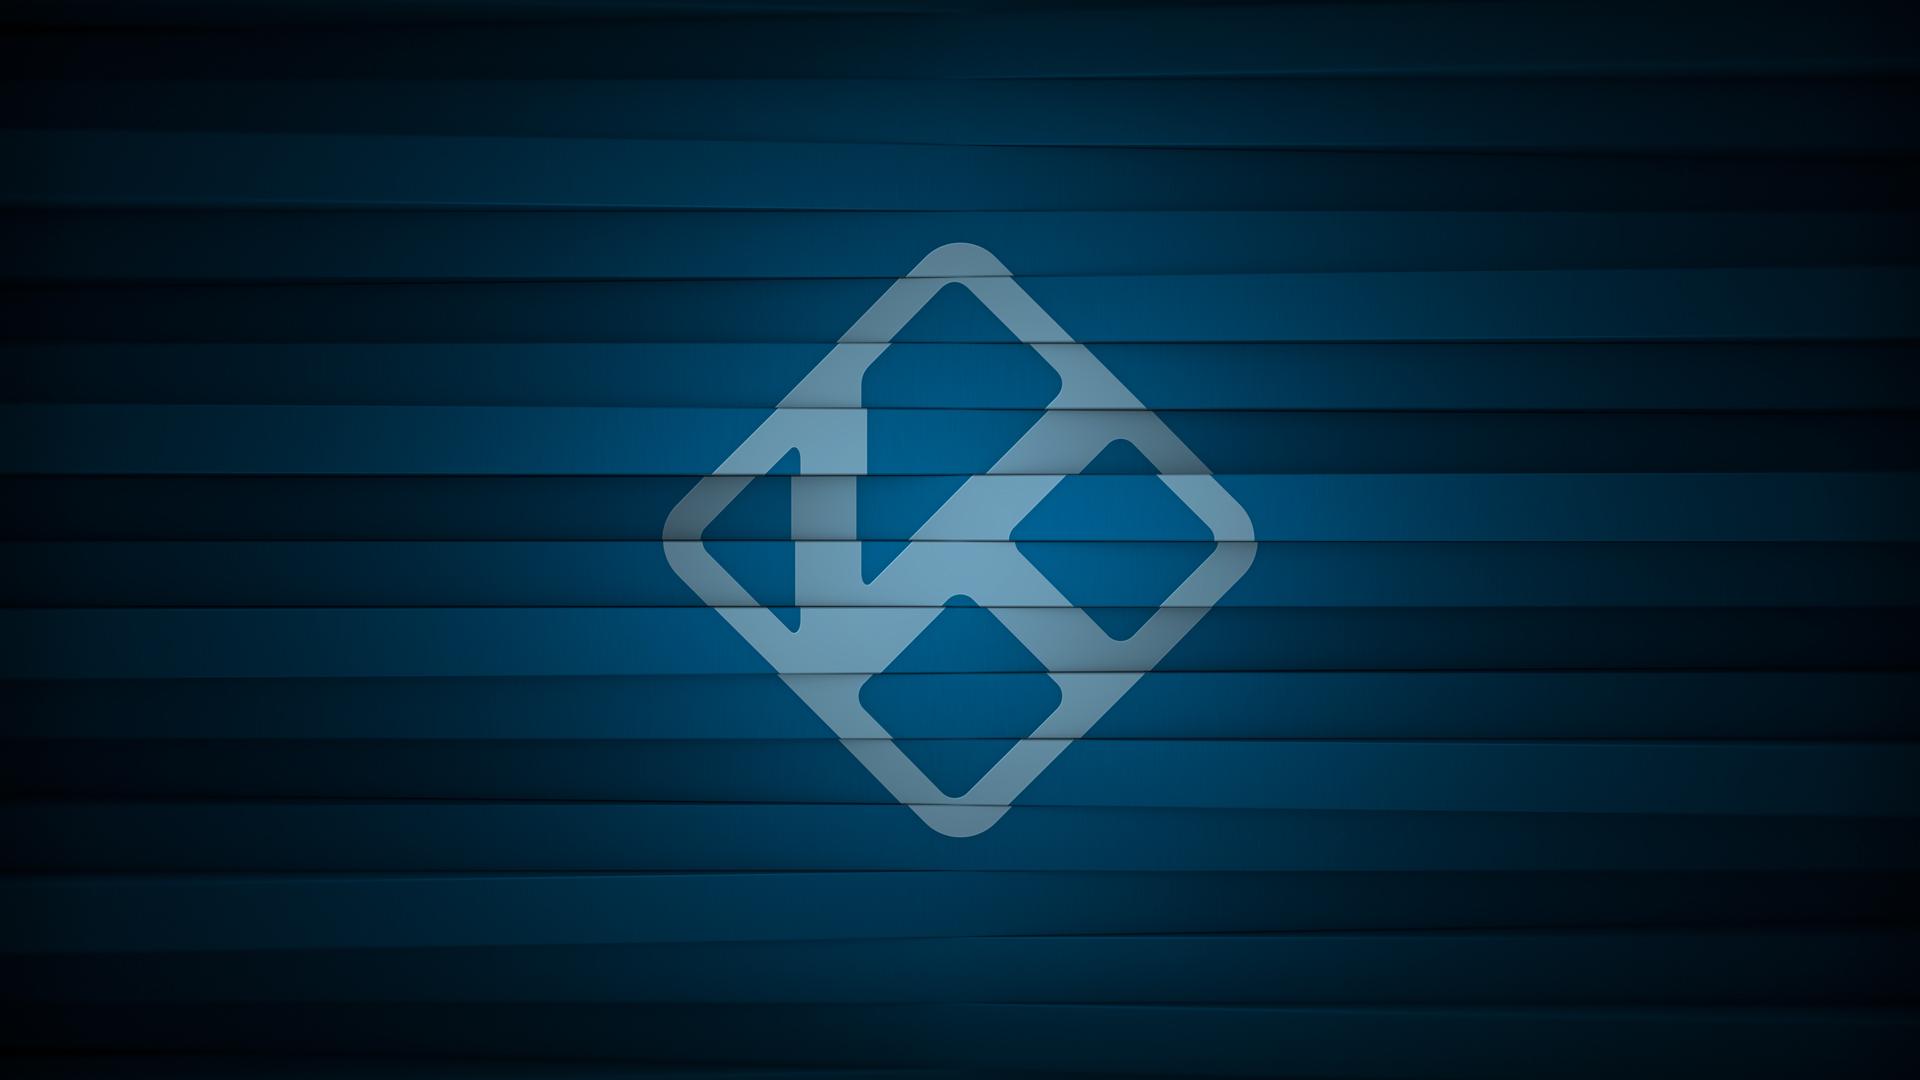 Wallpaper download kodi - Wallpaper 11a Download Hd 1080p Download Uhd 2160p Wallpaper 11b